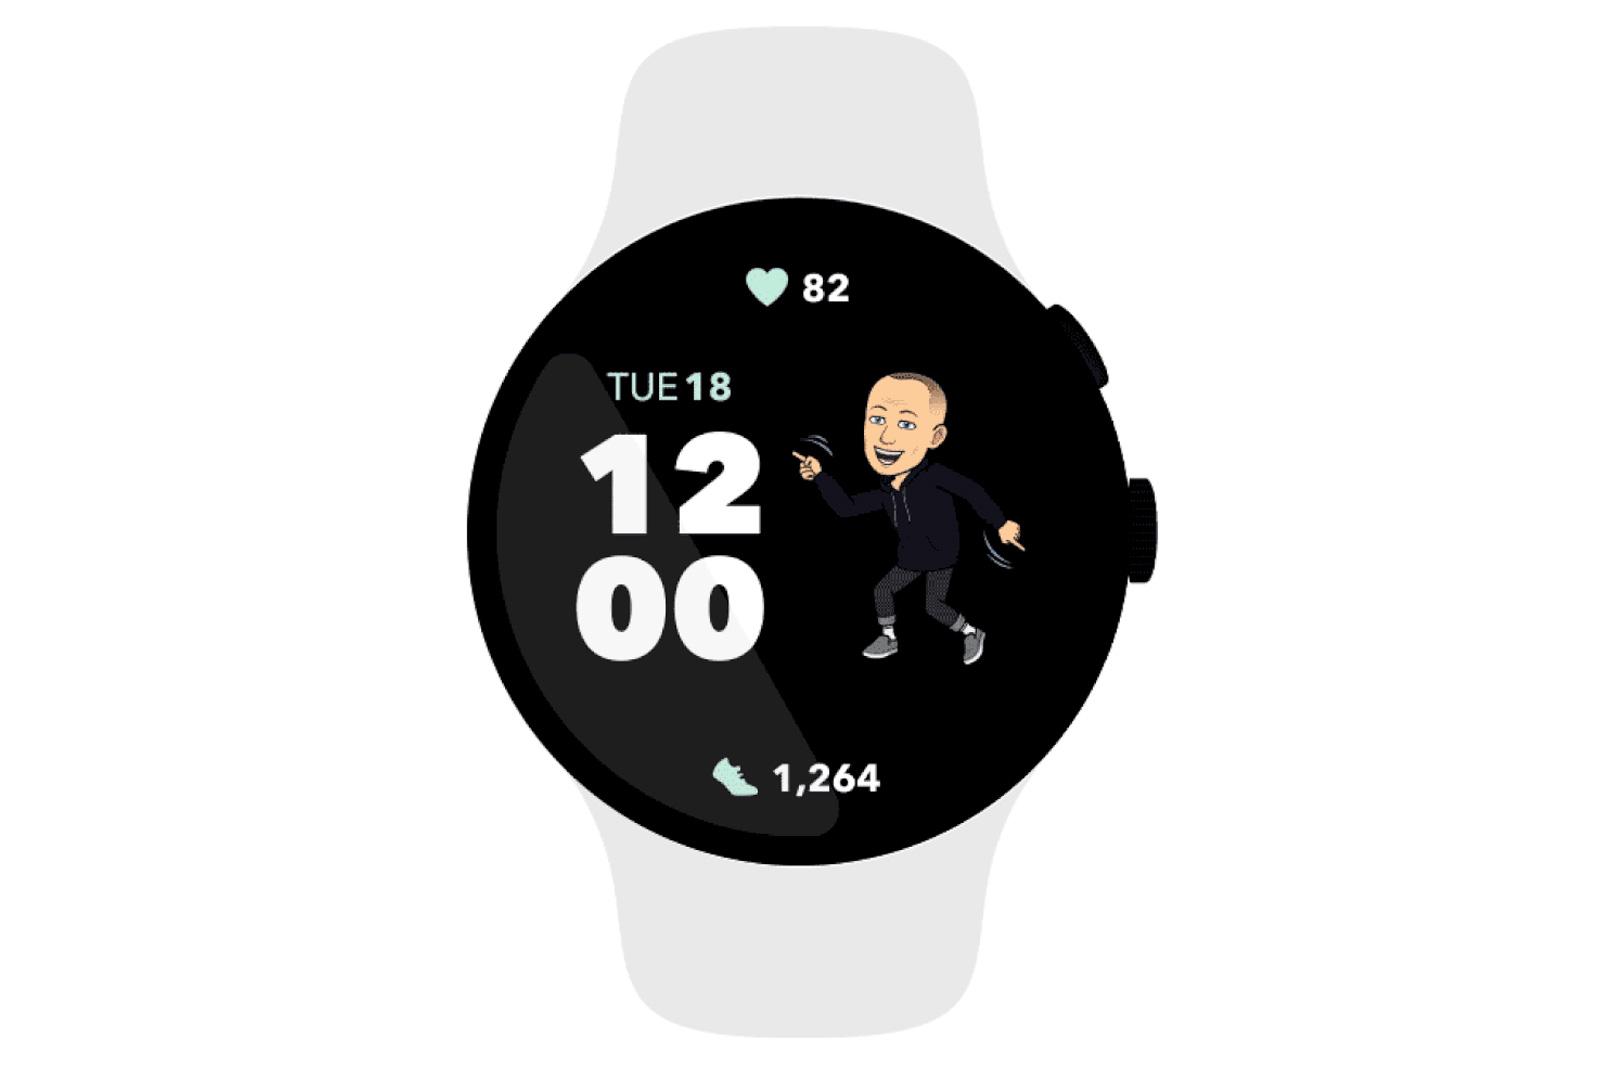 Wear OS 3